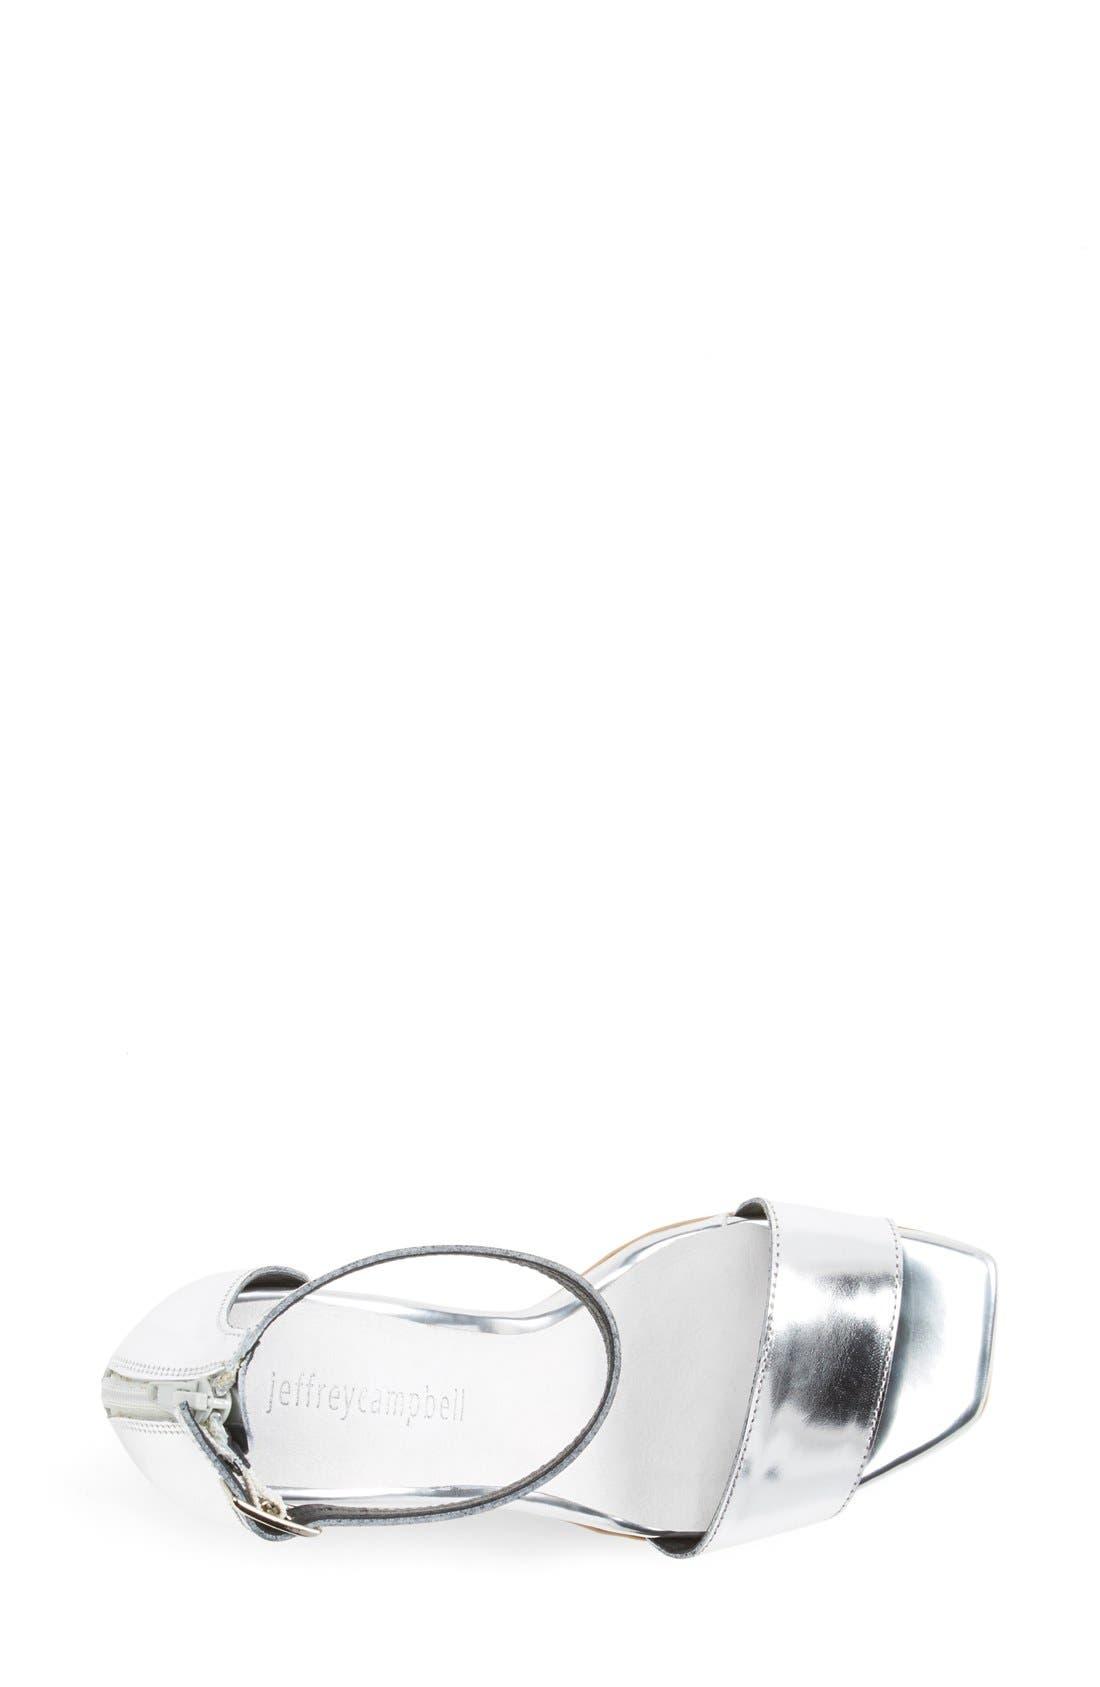 Alternate Image 3  - Jeffrey Campbell 'Manor' Metallic Leather Ankle Strap Sandal (Women)